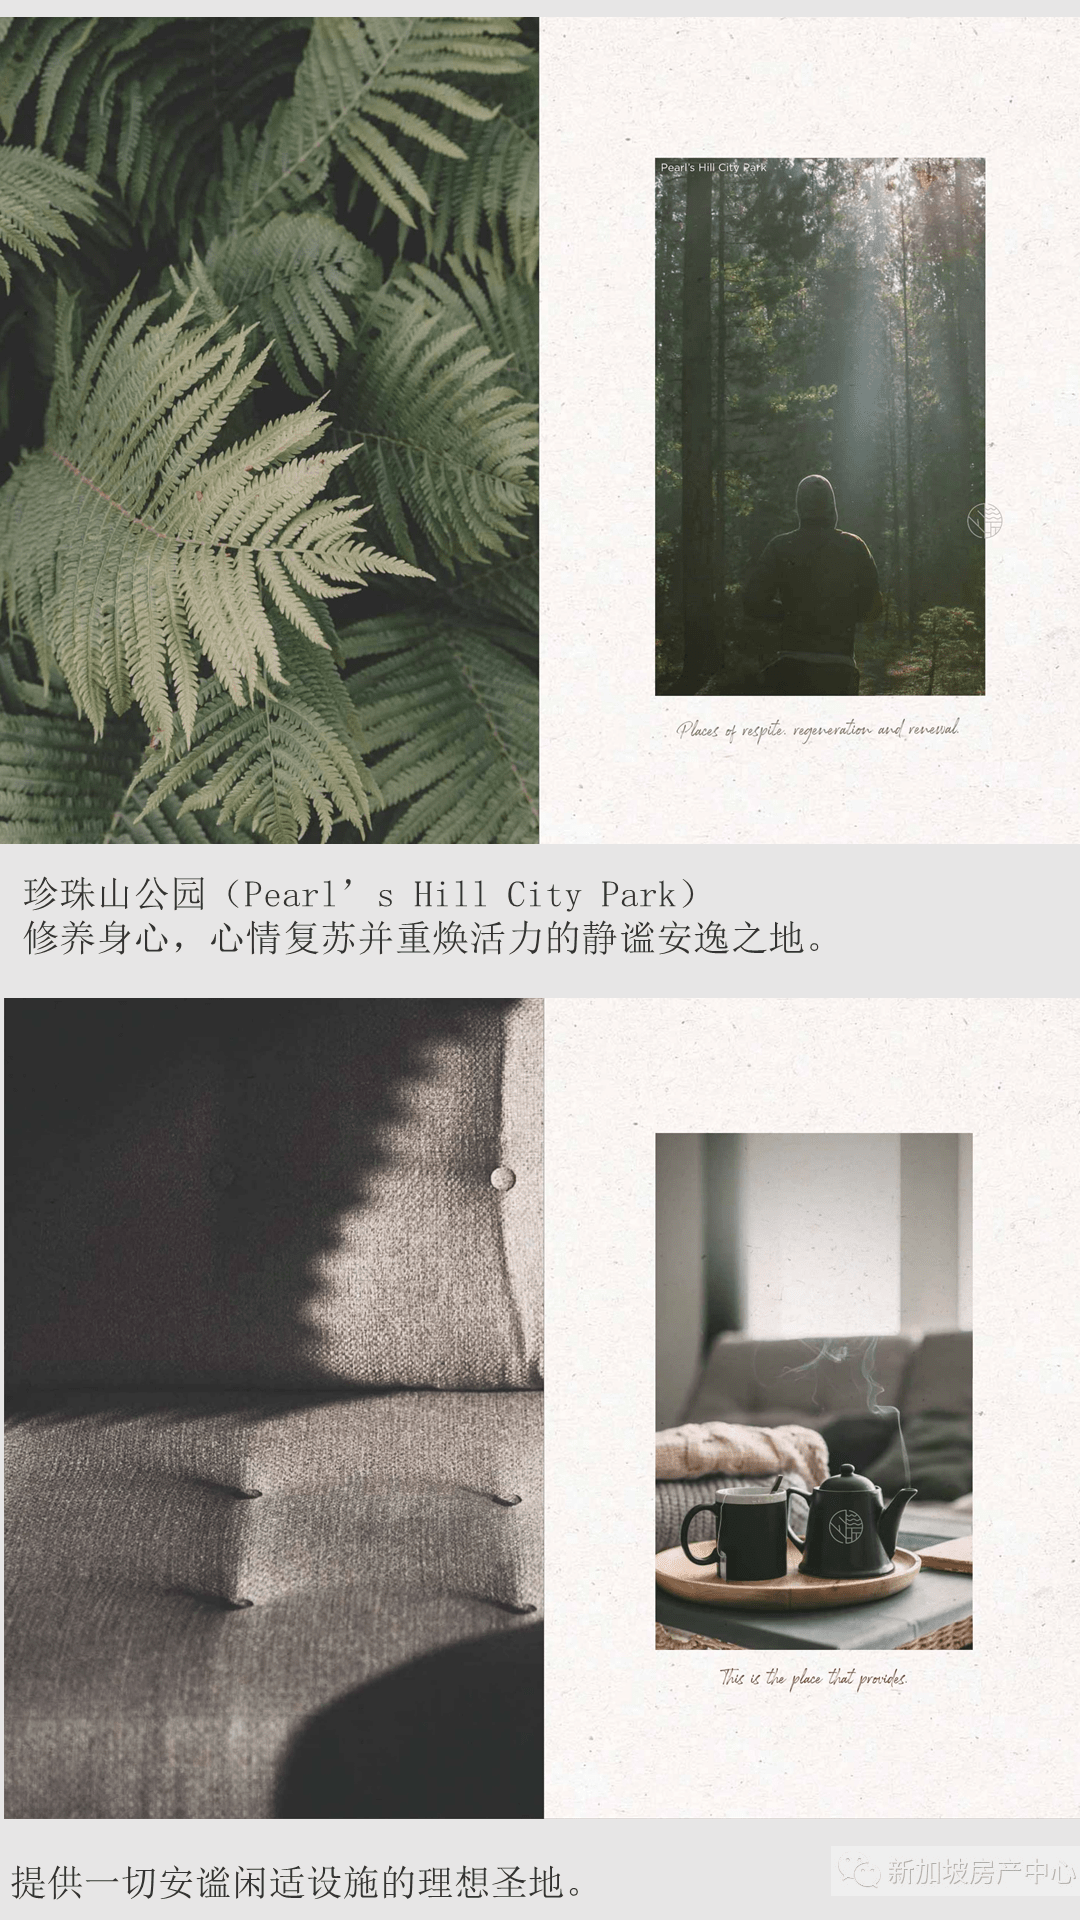 幻灯片8-min.PNG